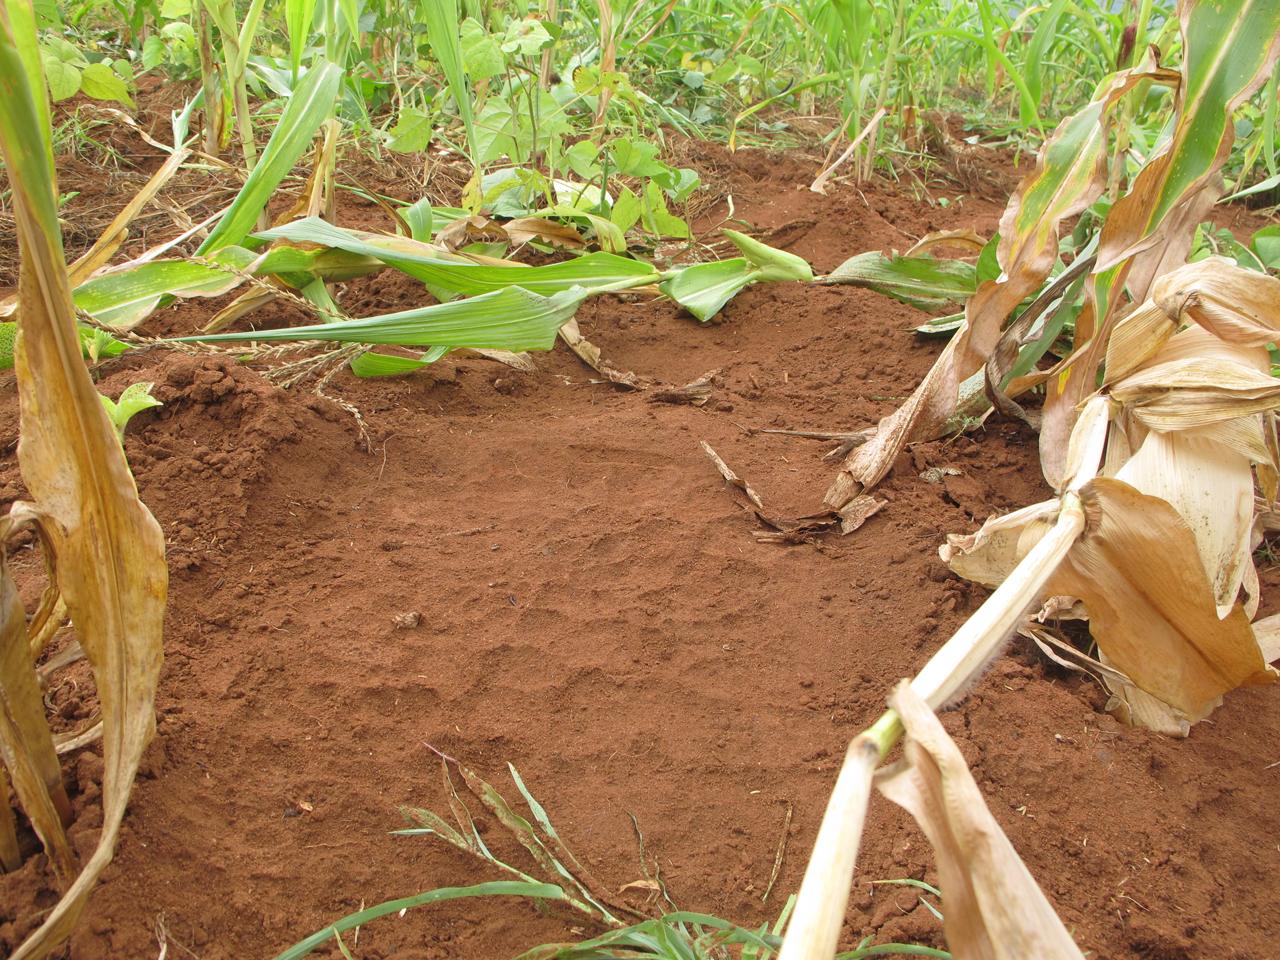 CROP-RAIDING-Damaged-crops